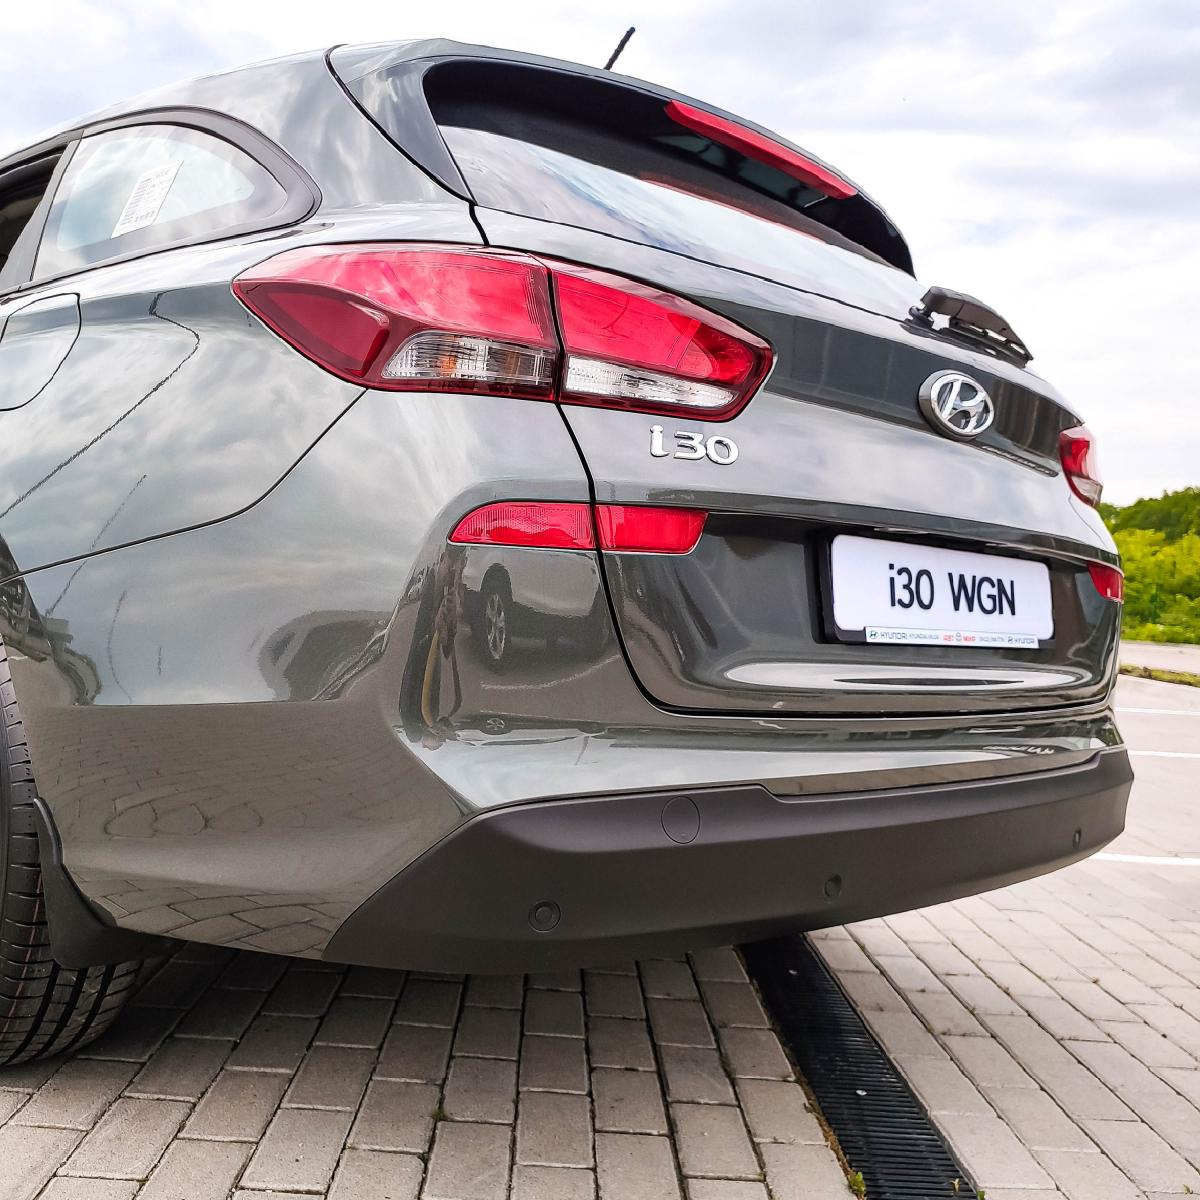 Спеціальна вигода на придбання Hyundai i30 WGN!   Хюндай Мотор Україна - фото 14